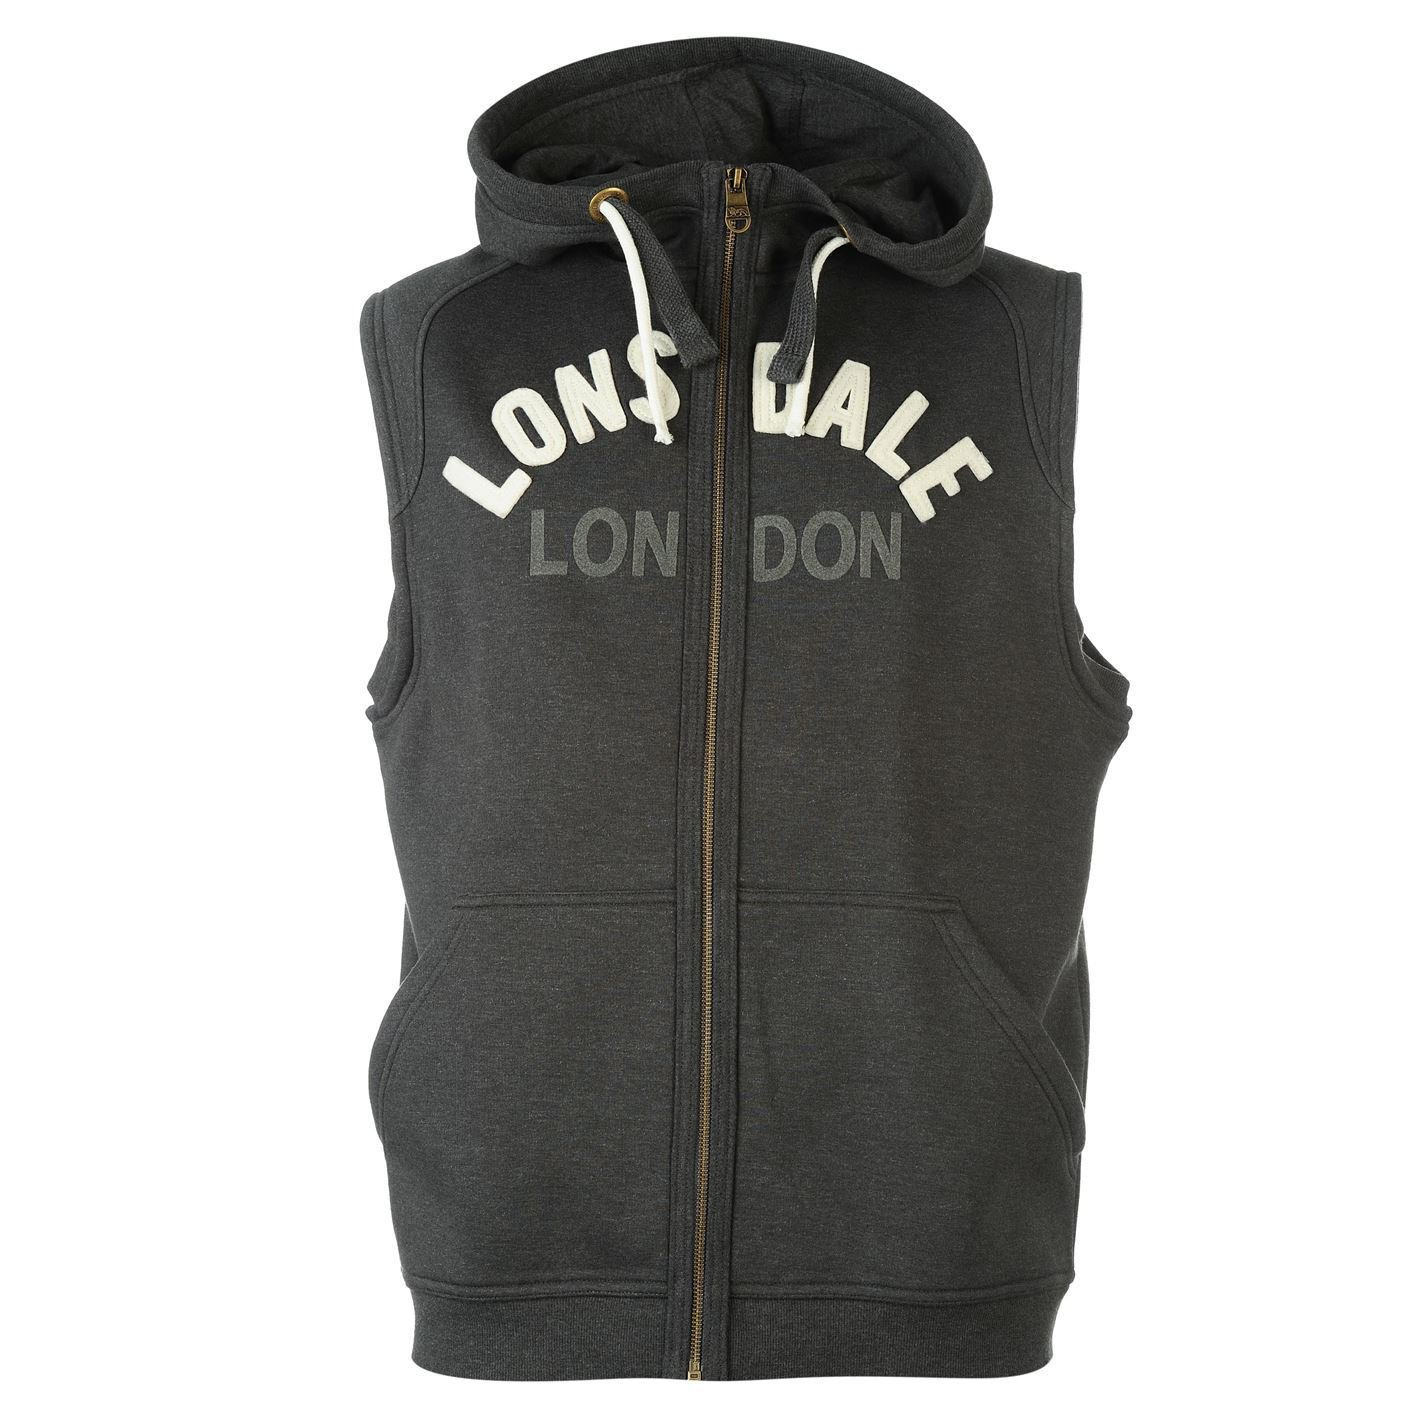 Lonsdale Mens Box SlesHd2 Boxing Hoodie Hooded Sweatshirt Top Clothing